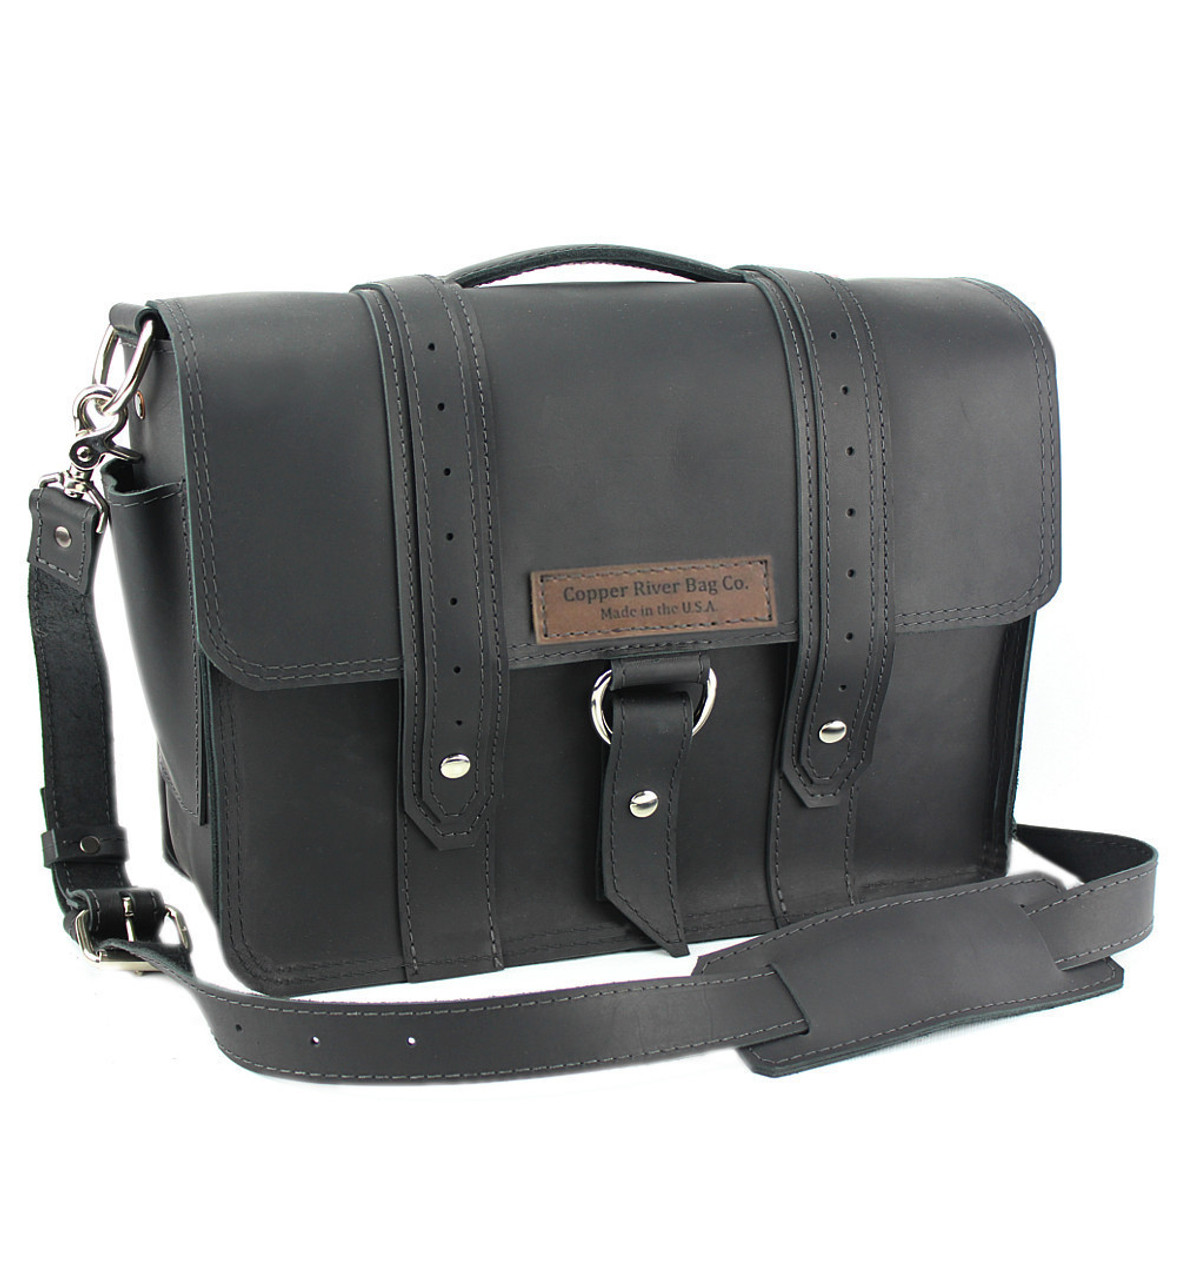 15 Large Sierra Voyager Laptop Bag In Black Napa Excel Leather